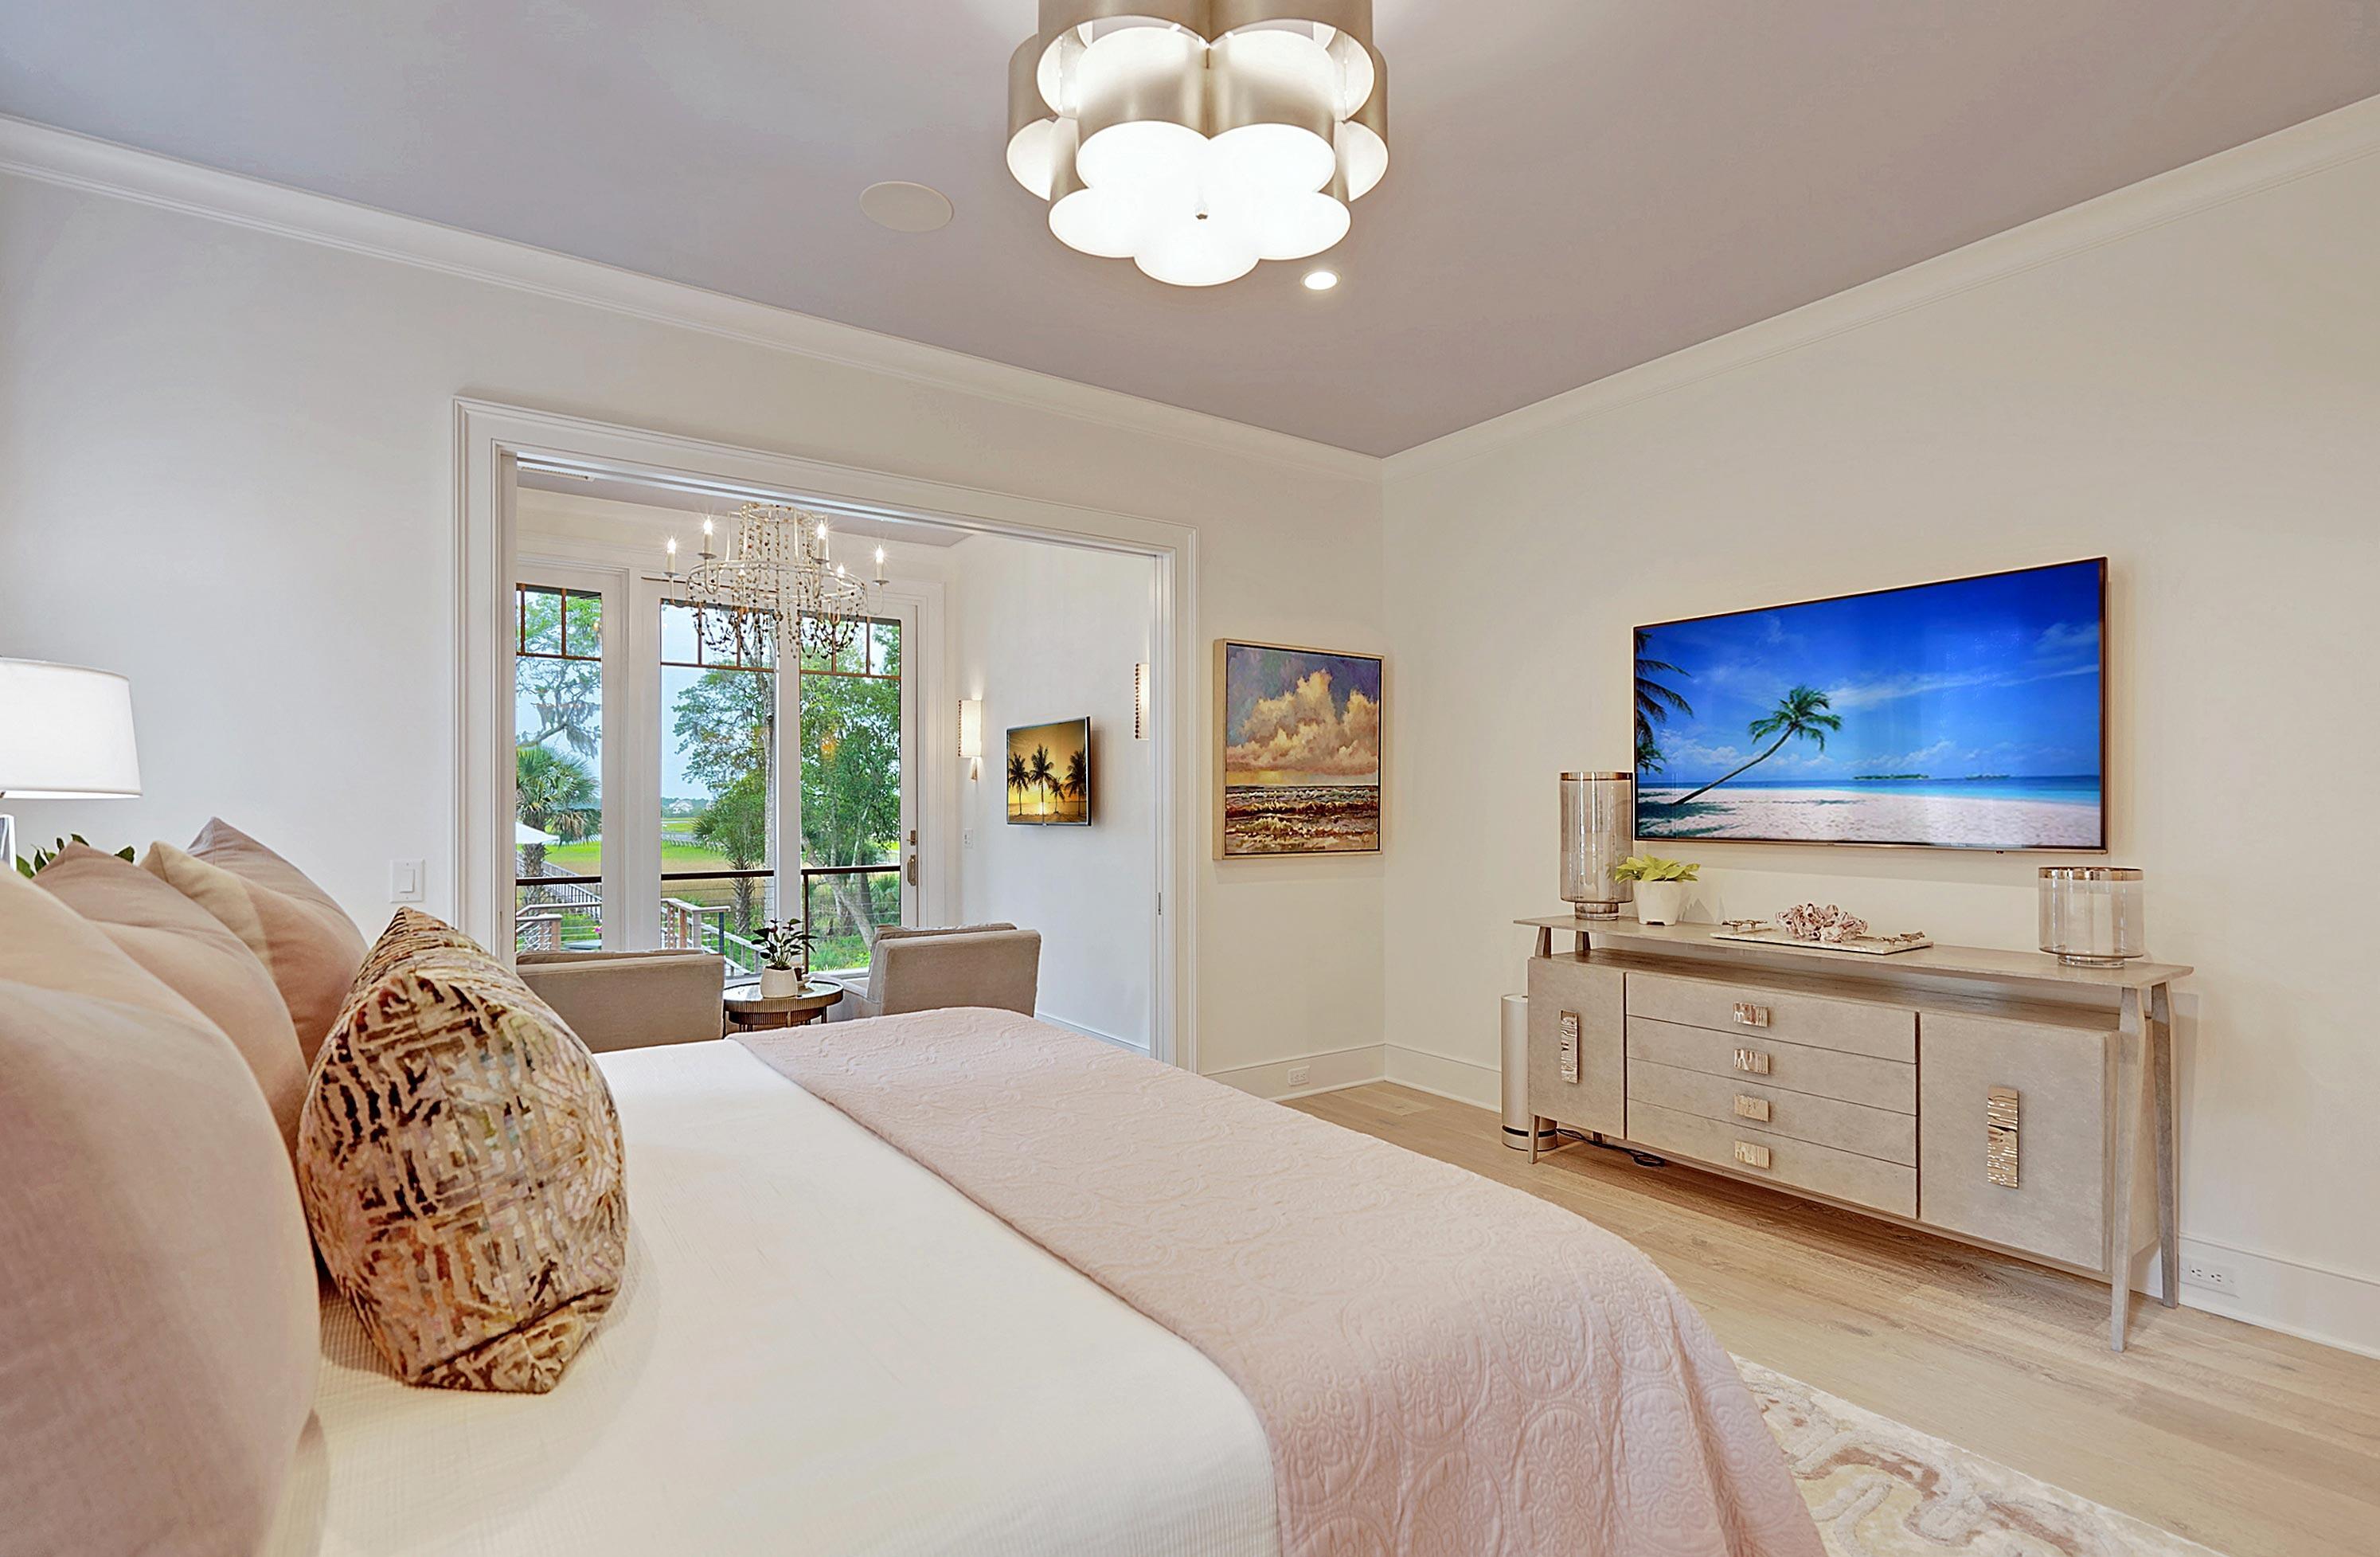 Beresford Hall Homes For Sale - 621 Barbados, Charleston, SC - 21